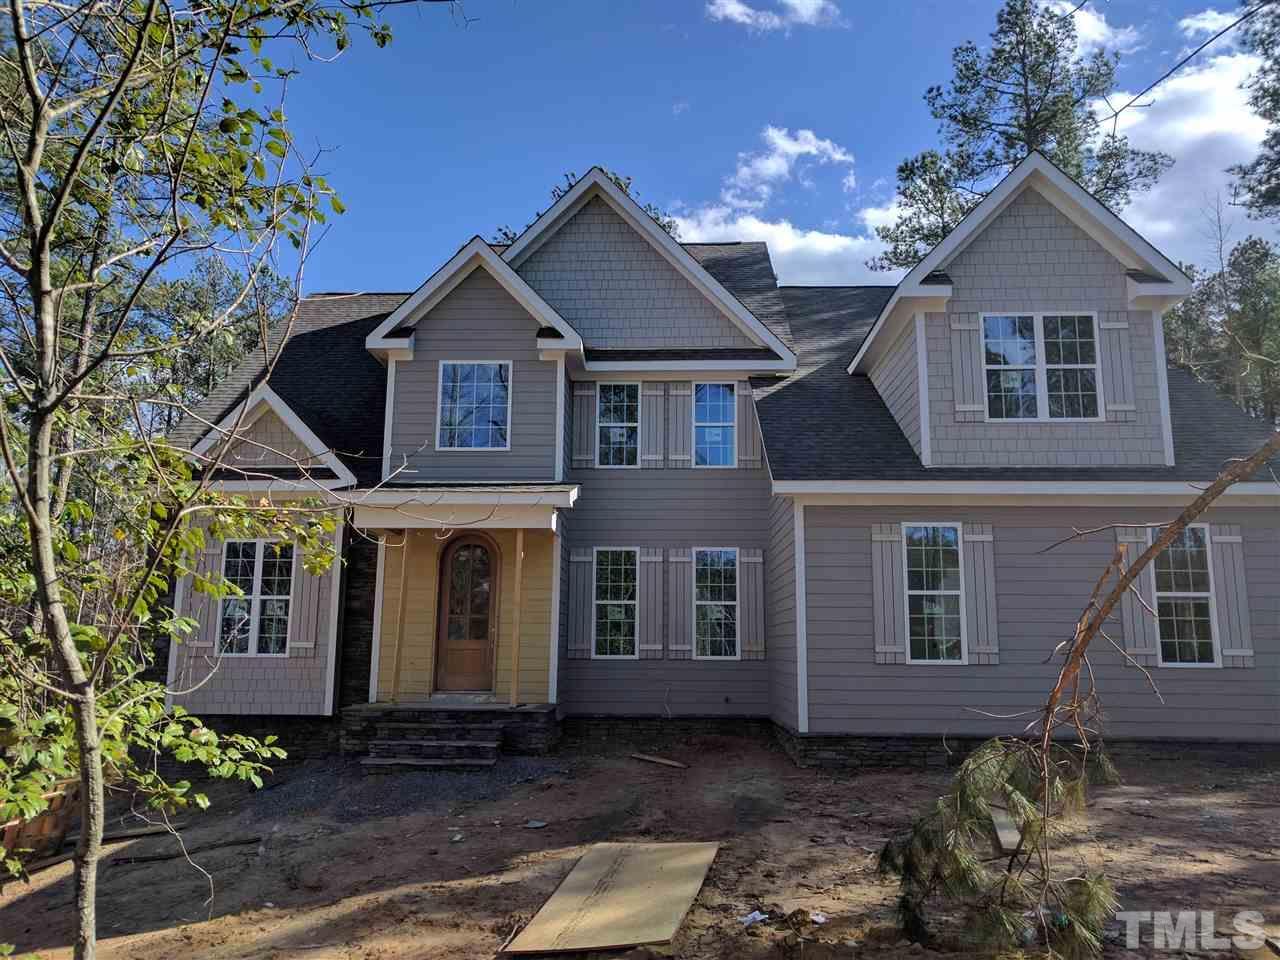 218 Valley View Lane (Lot 17), Pittsboro, NC 27312